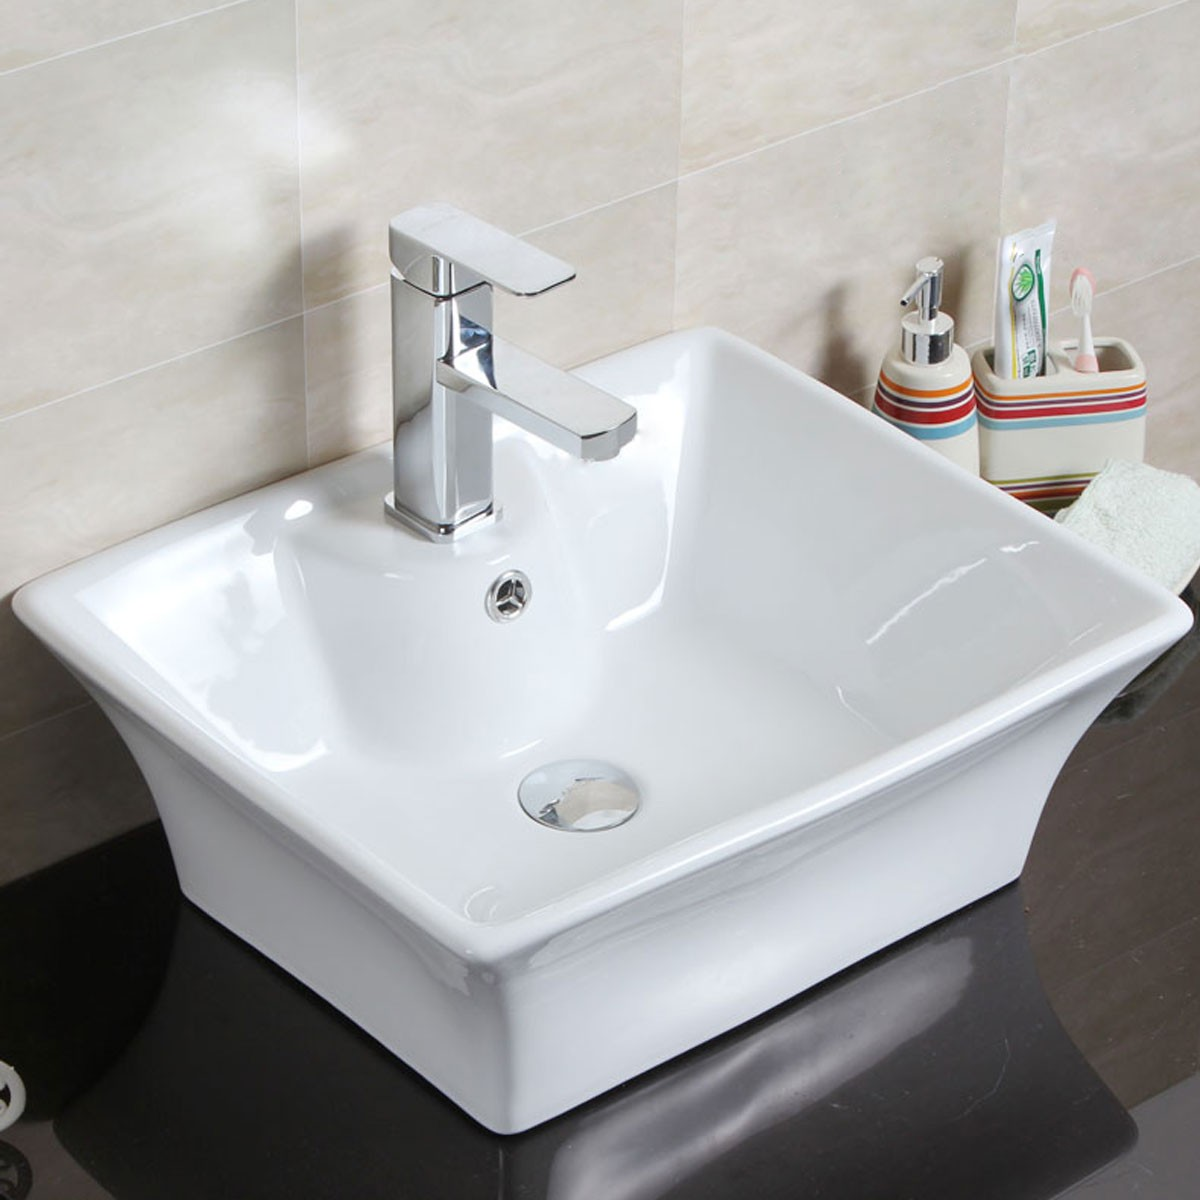 Decoraport White Rectangle Ceramic Above Counter Basin Vessel Vanity Sink (CL-1097)